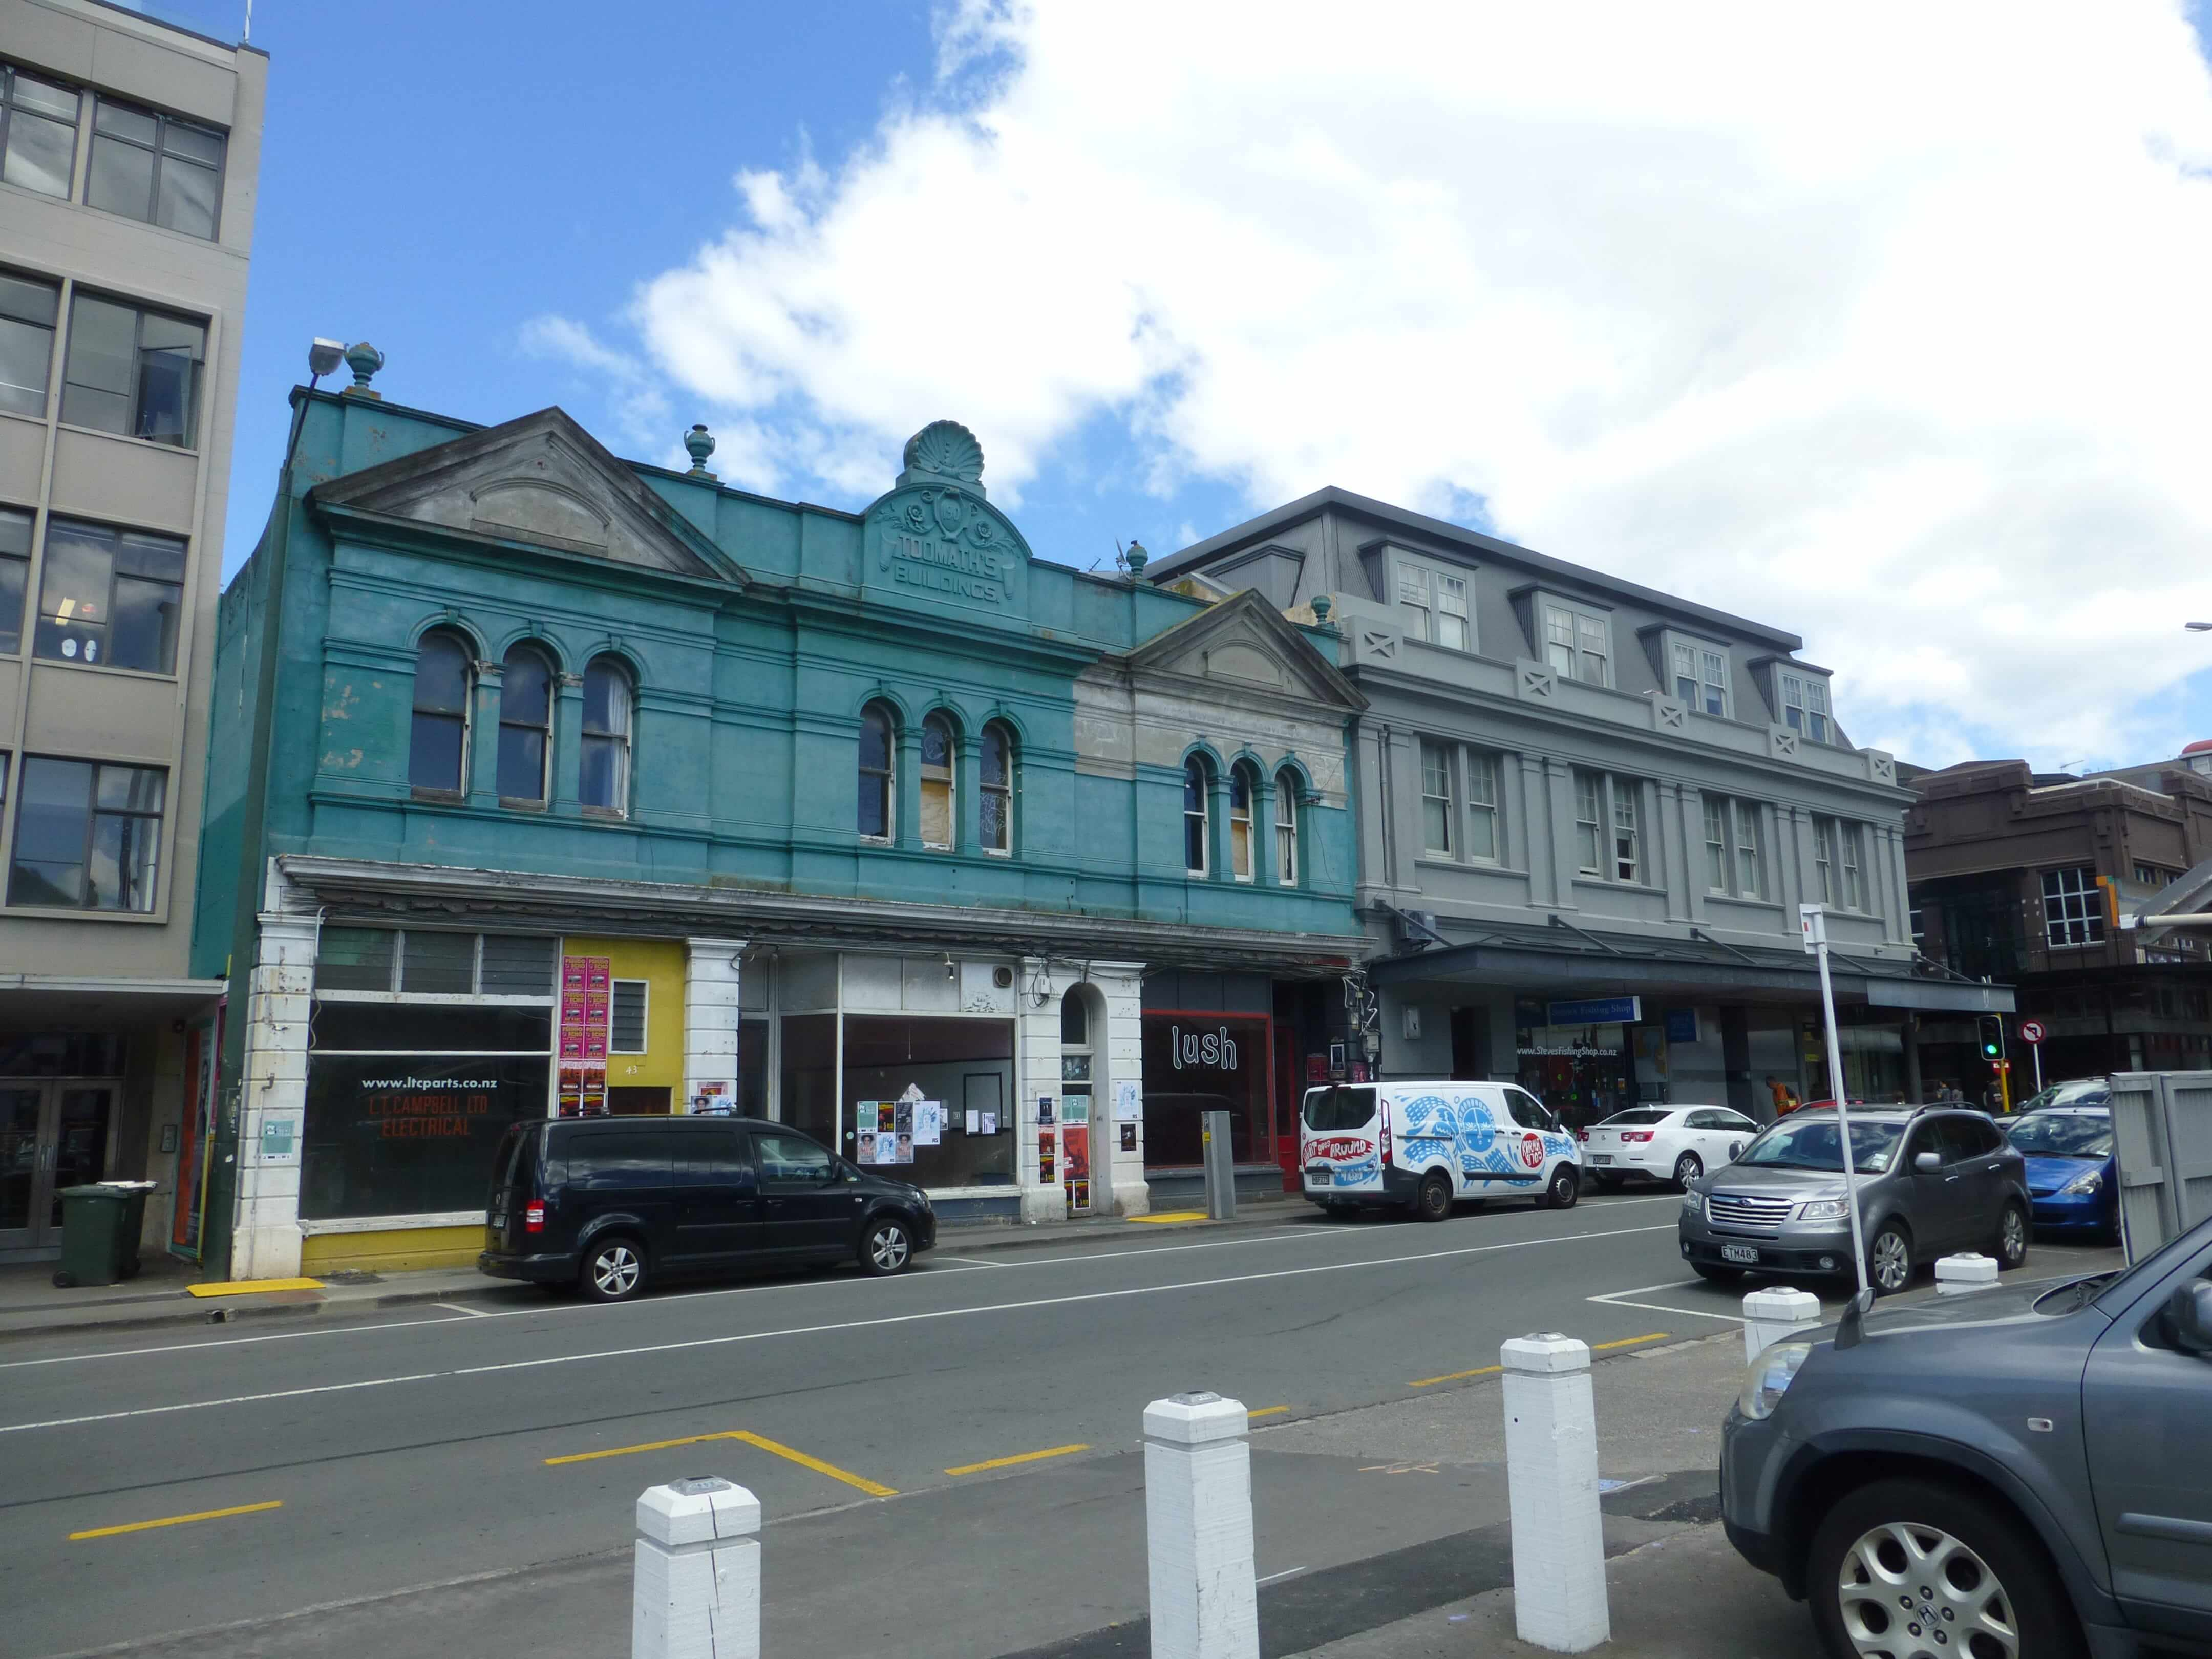 im Zentrum, Wellington, Neuseeland, Weit-weg.reisen 4